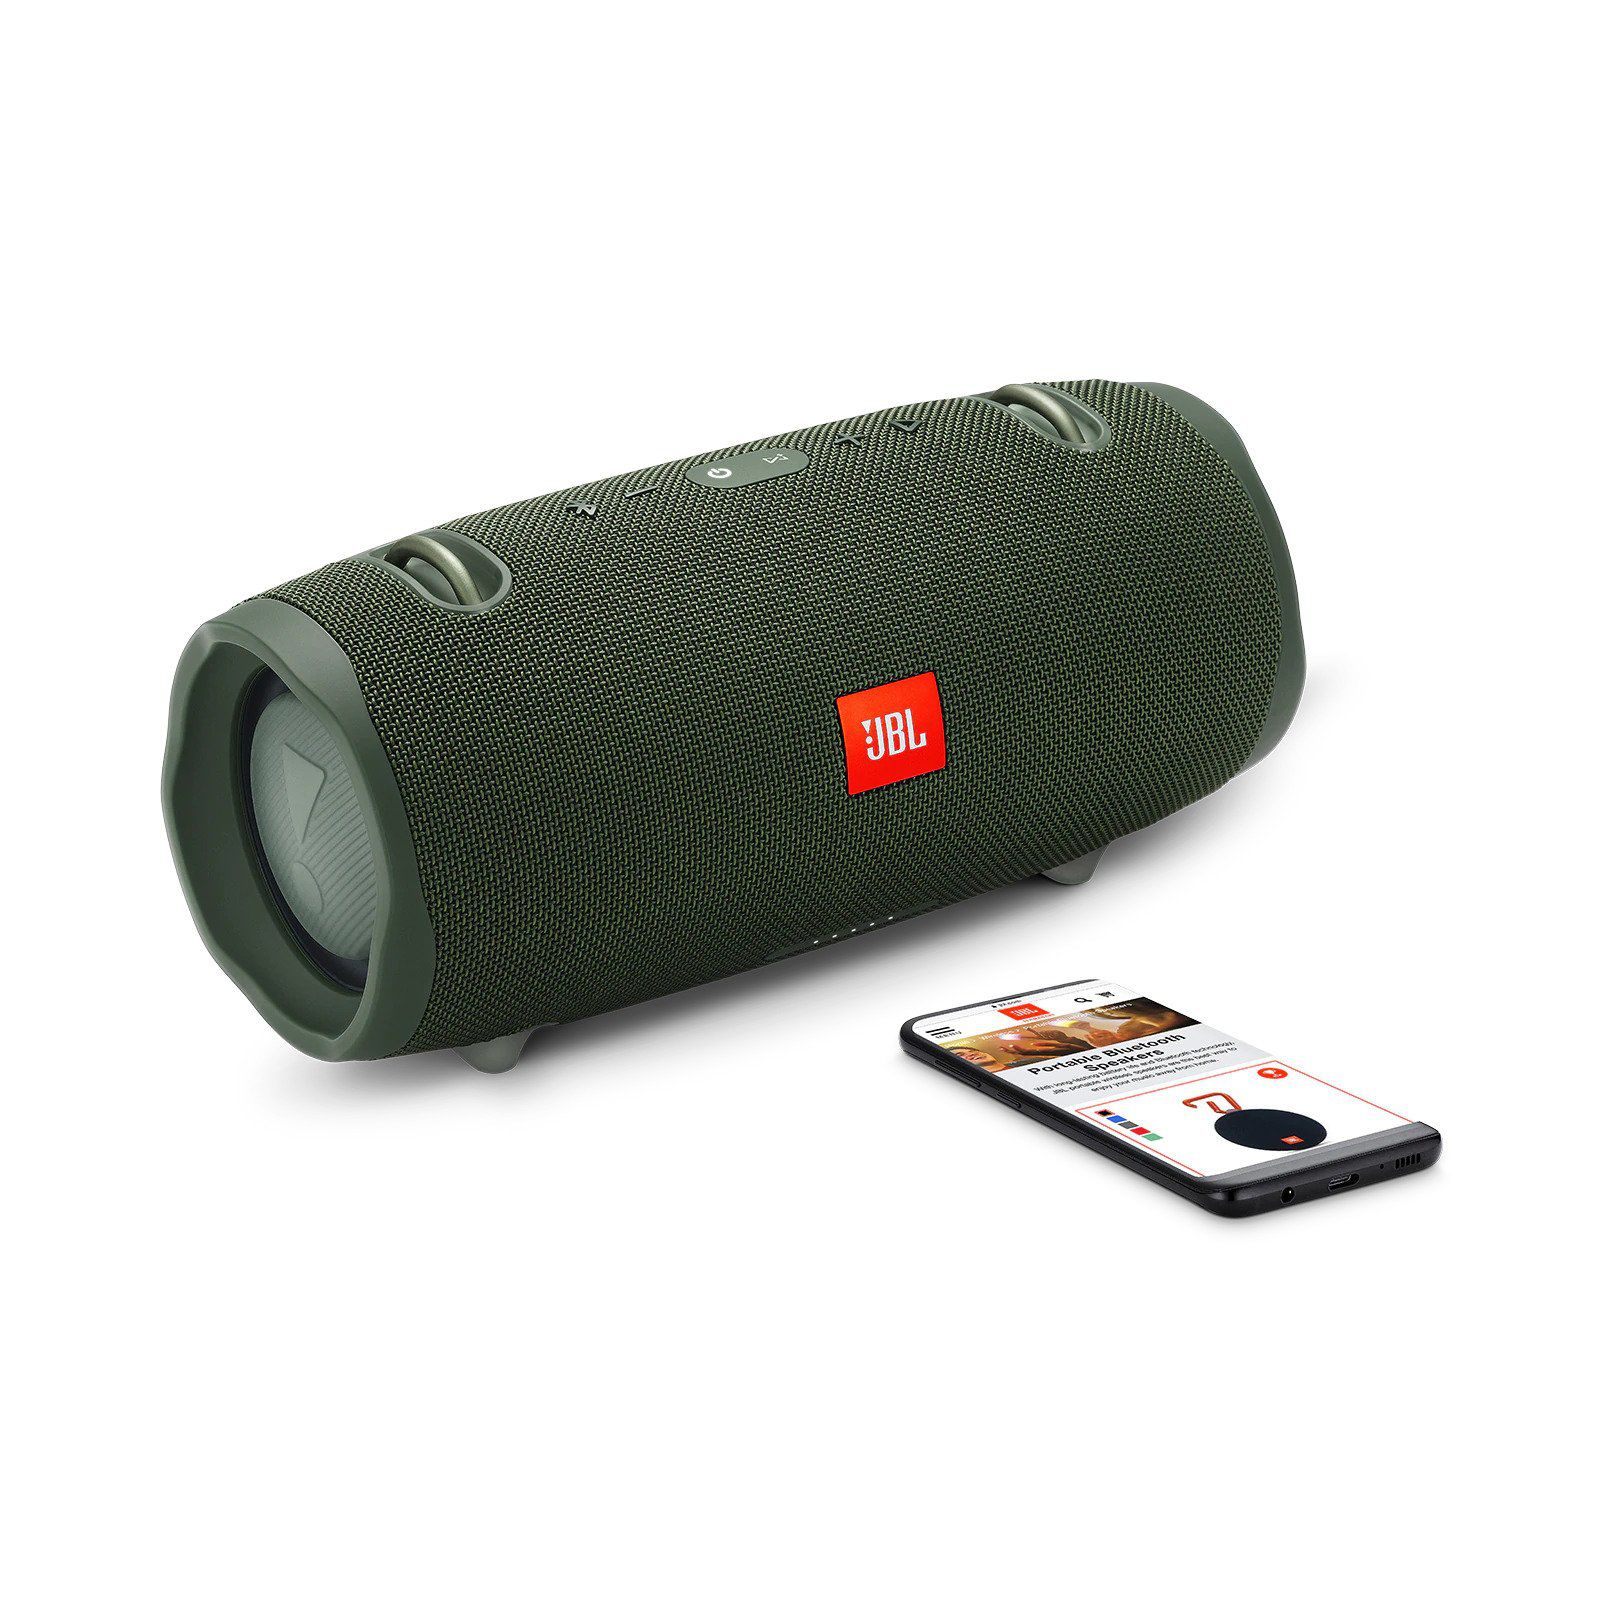 Caixa de Som Portátil JBL Xtreme 2 Verde Bluetooth - JBL